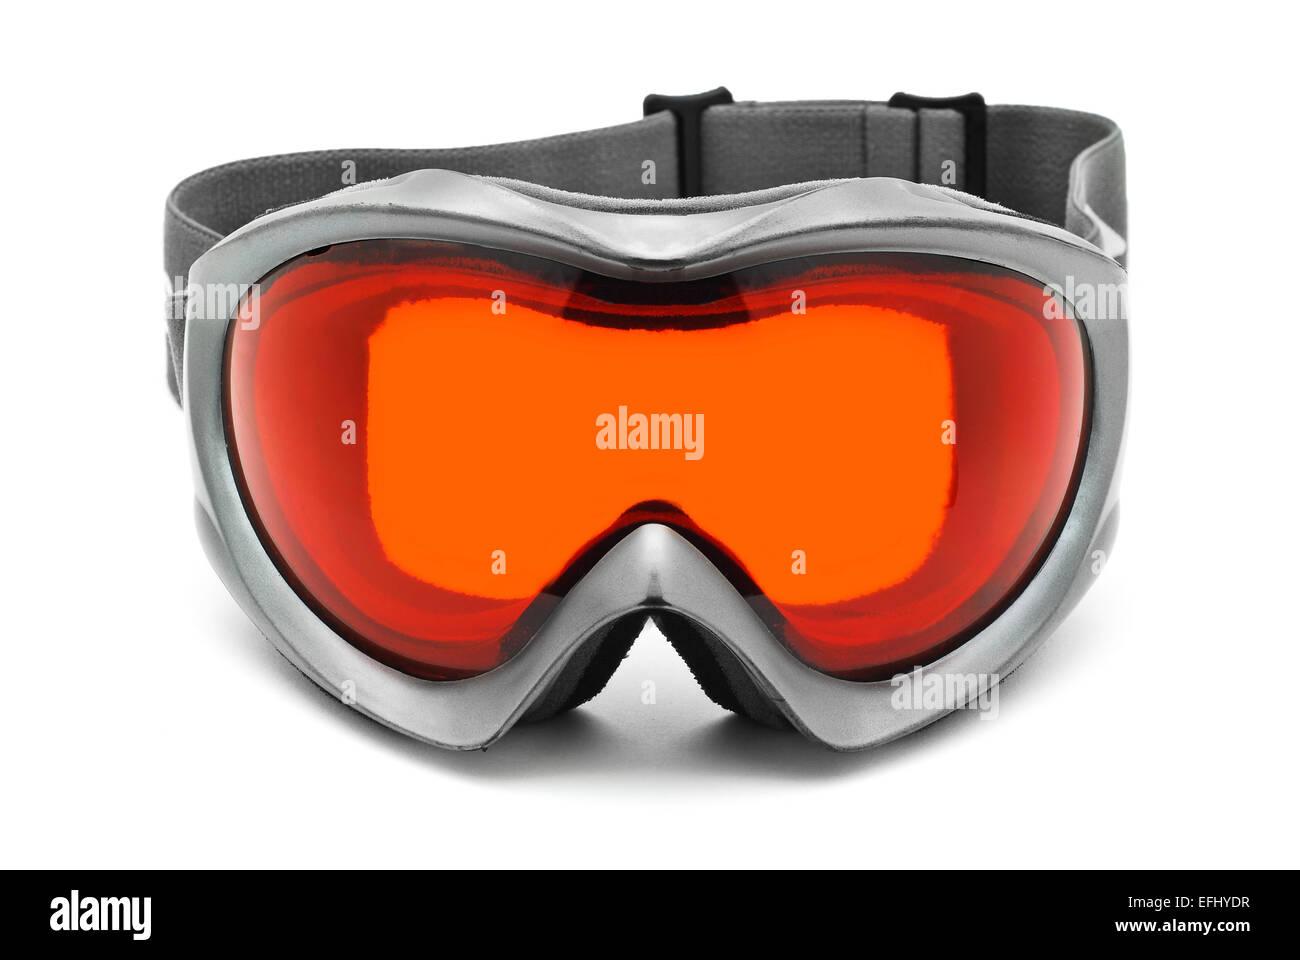 ski winter sport glasses on white - Stock Image